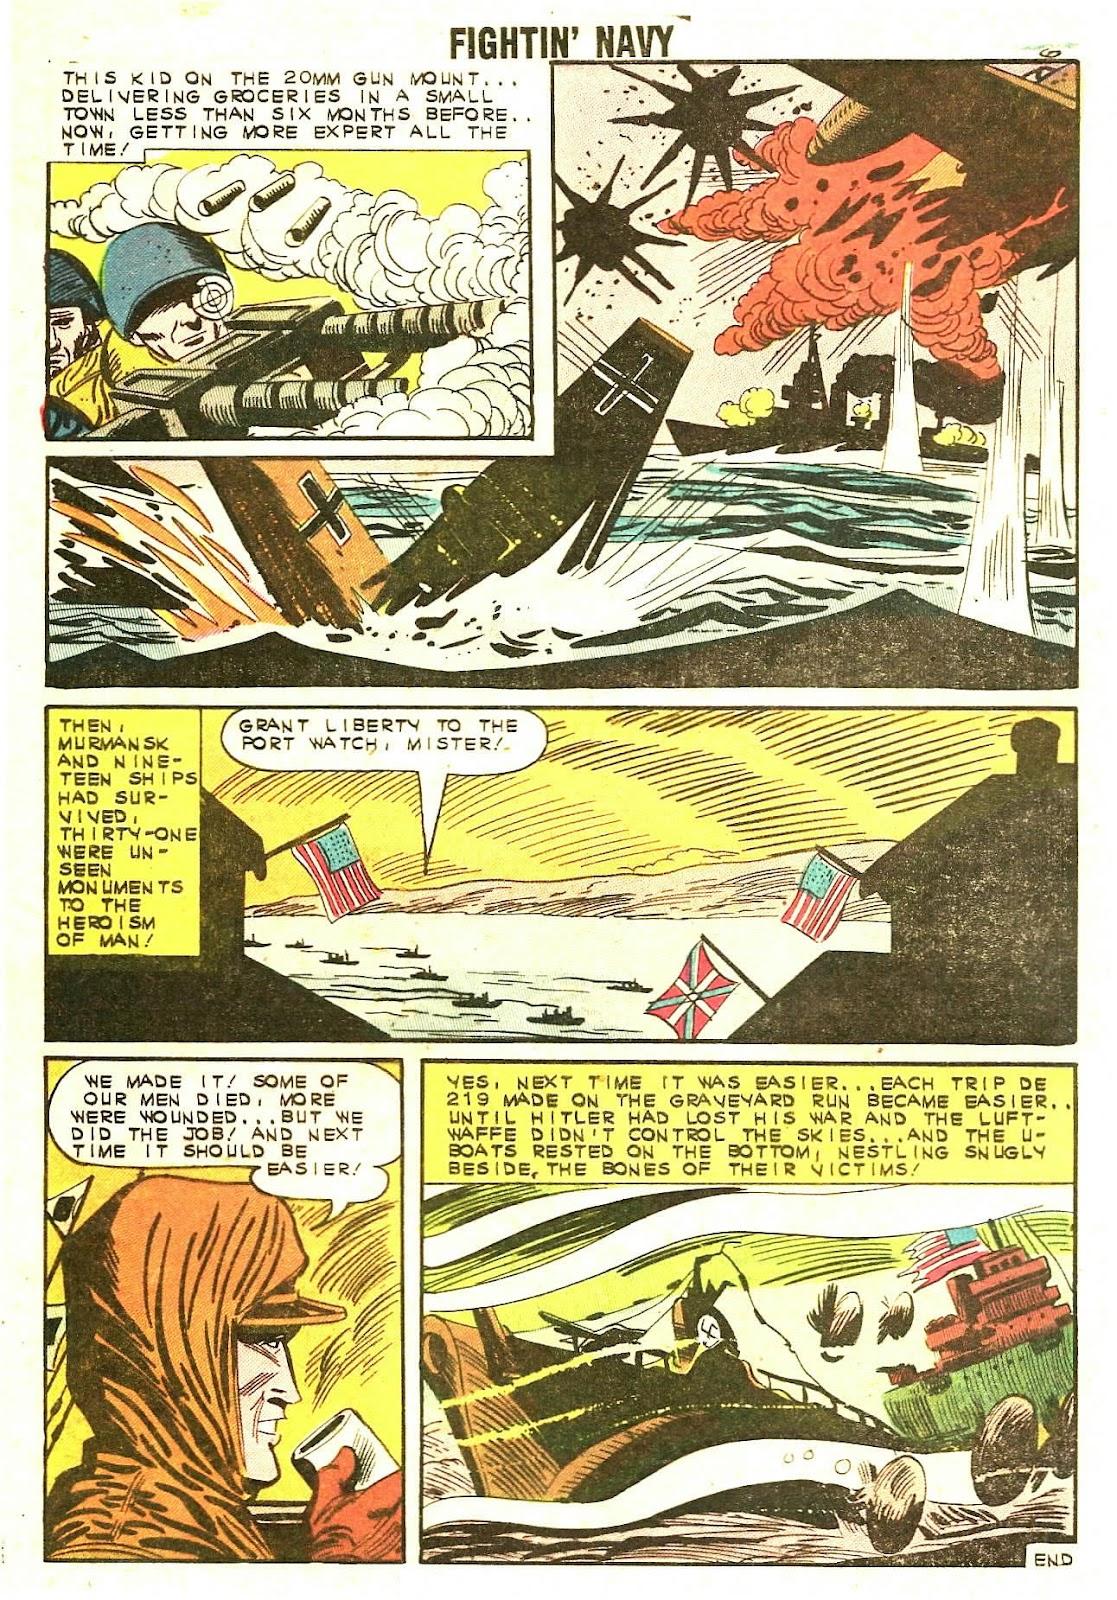 Read online Fightin' Navy comic -  Issue #110 - 8